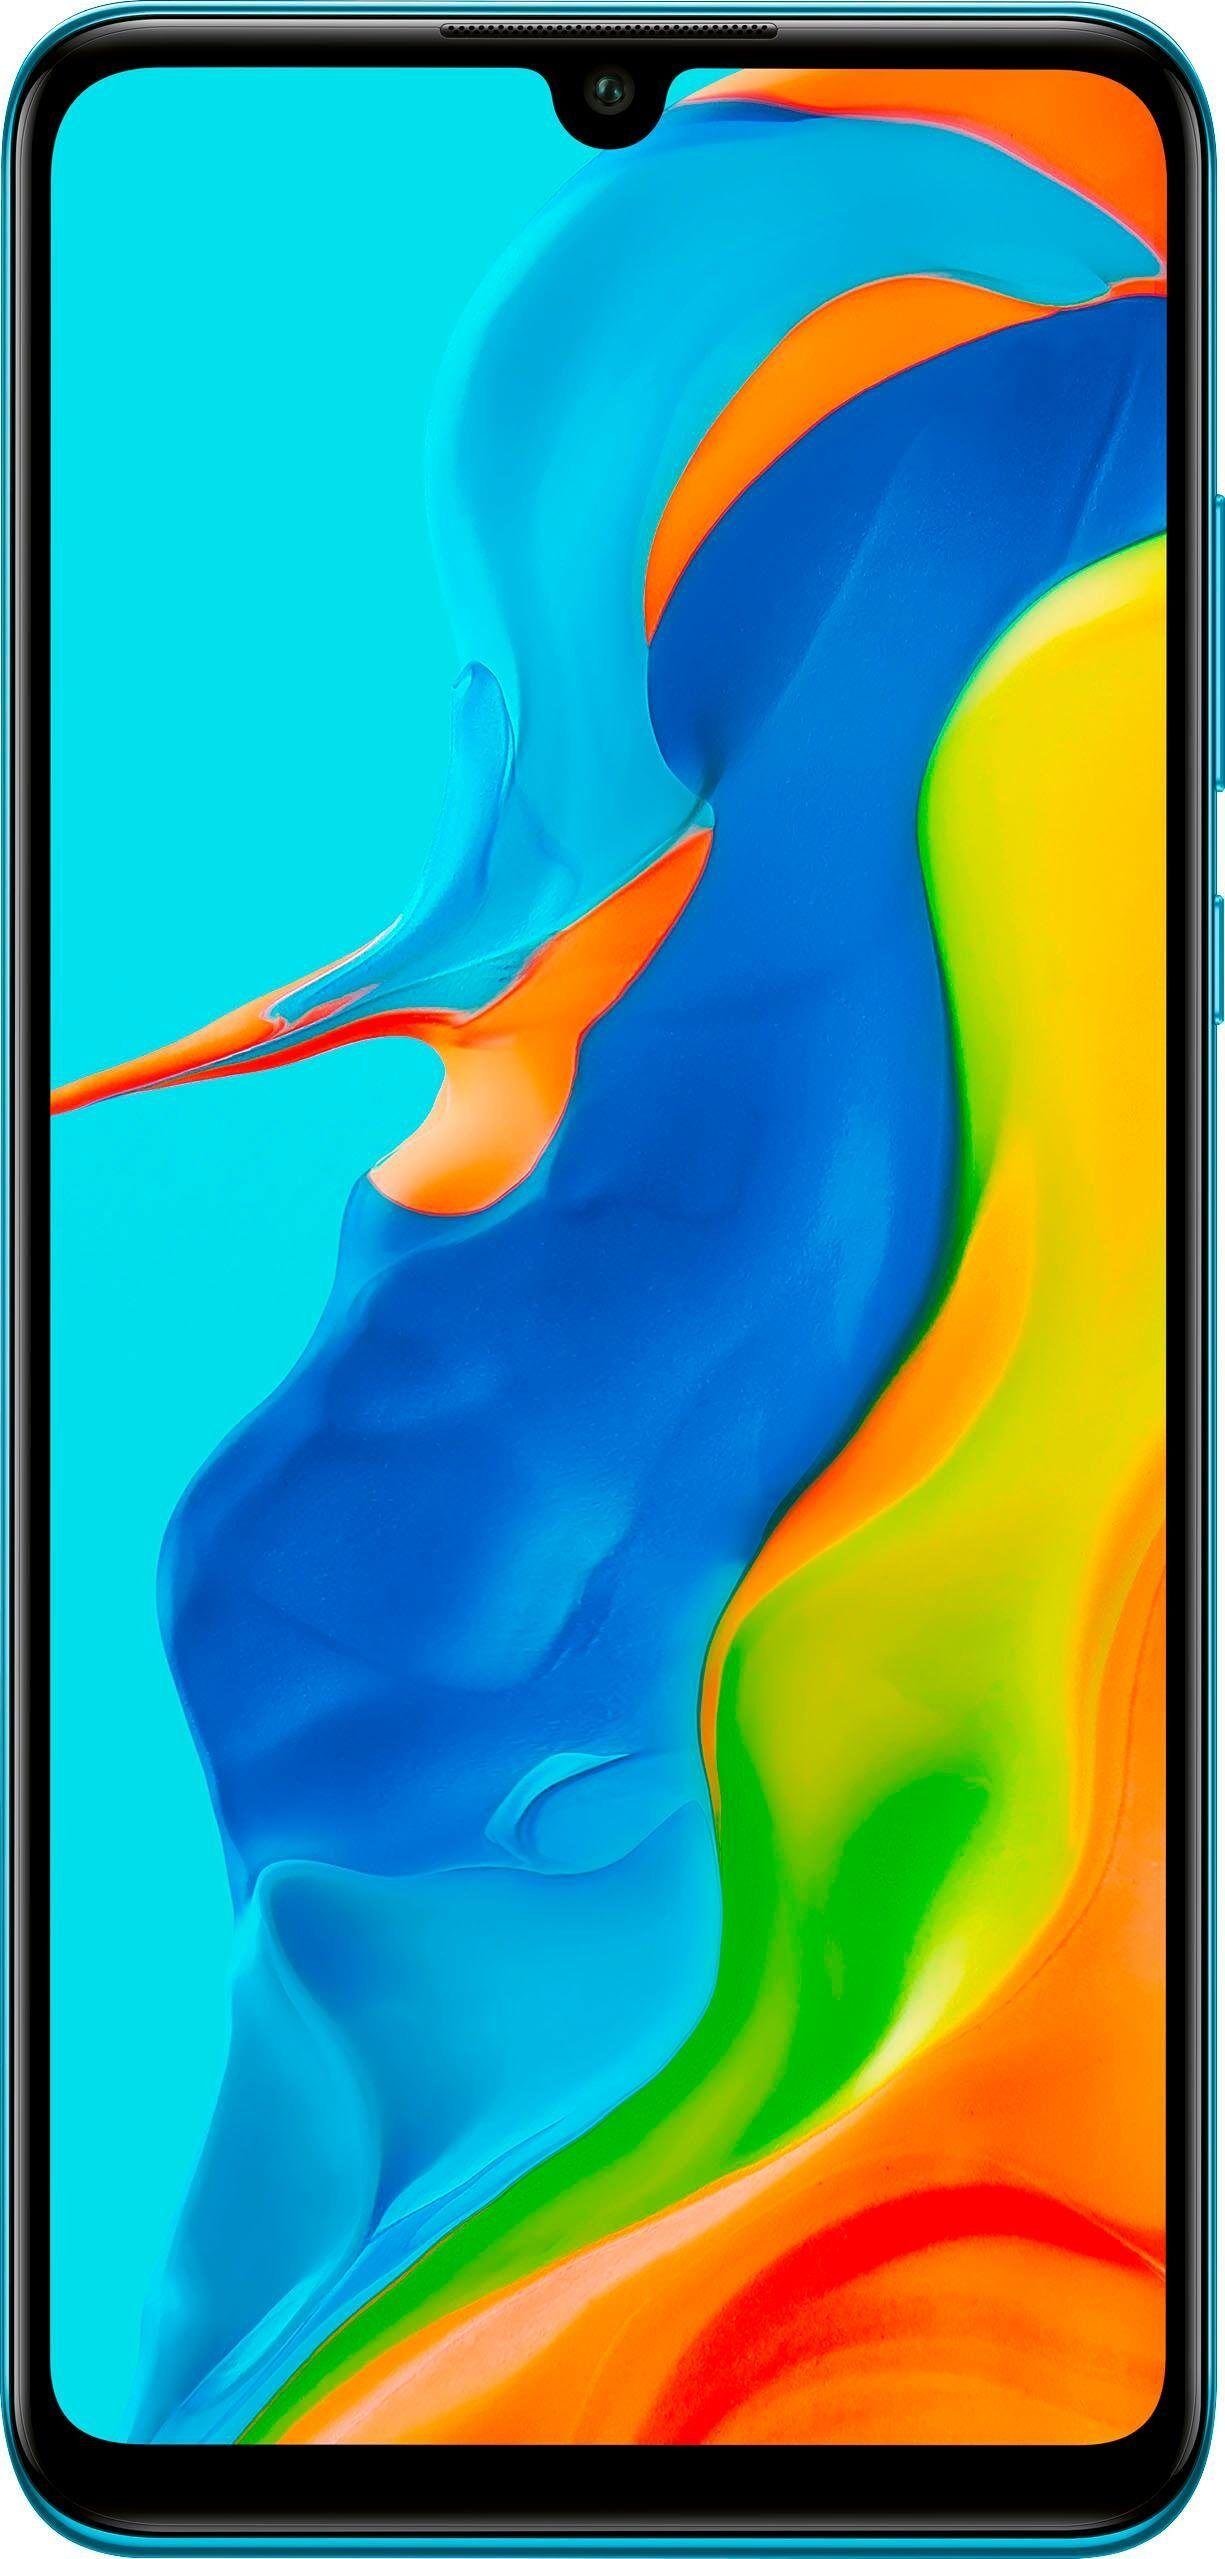 Huawei P30 Lite New Edition Smartphone (15,62 cm/6,15 Zoll, 256 GB Speicherplatz, 48 MP Kamera), peacock blue